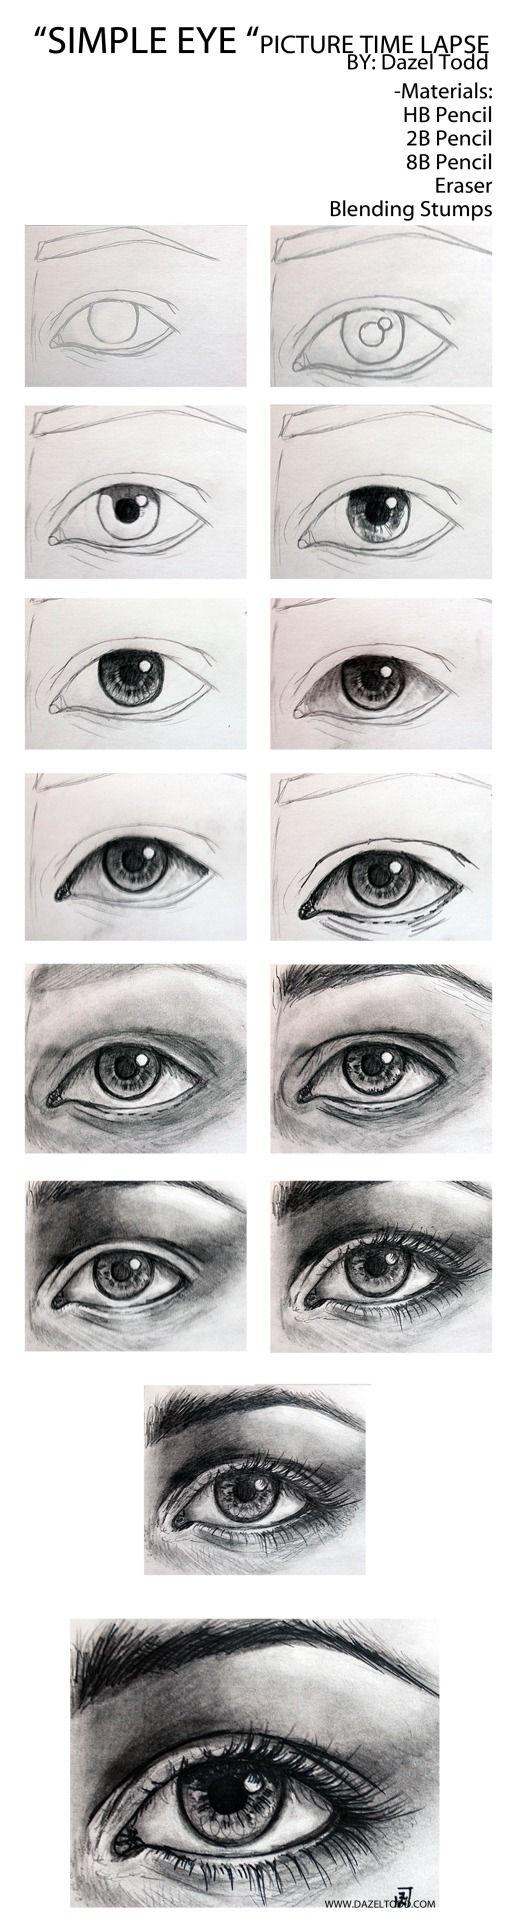 How To Draw Eyes To Organize Pinterest Kresba Tuzkou Rty A Oci